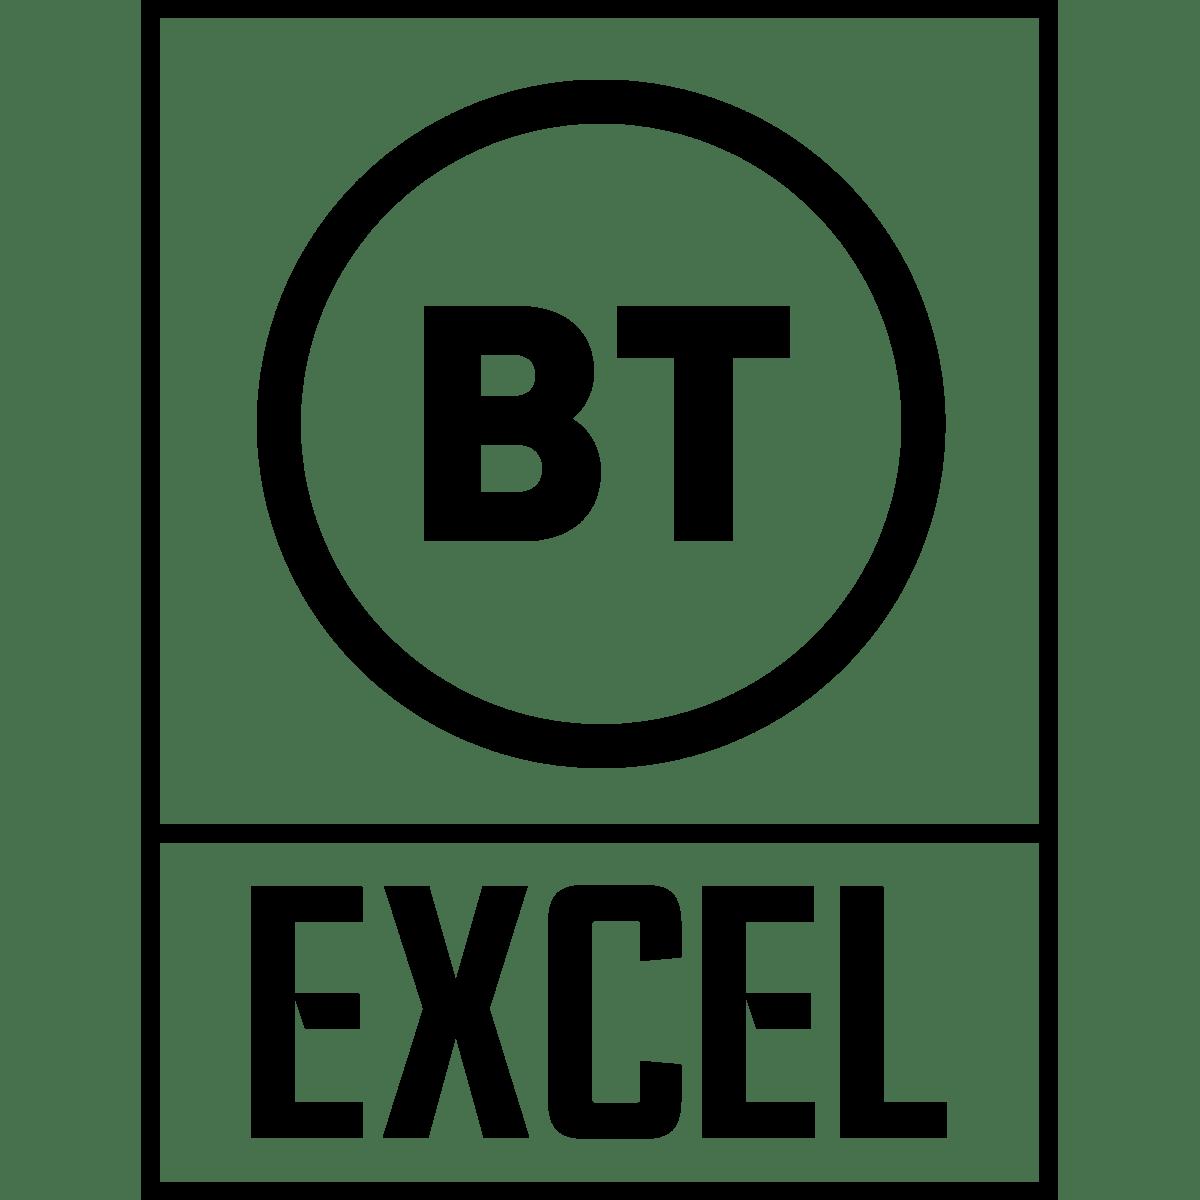 BT Excel